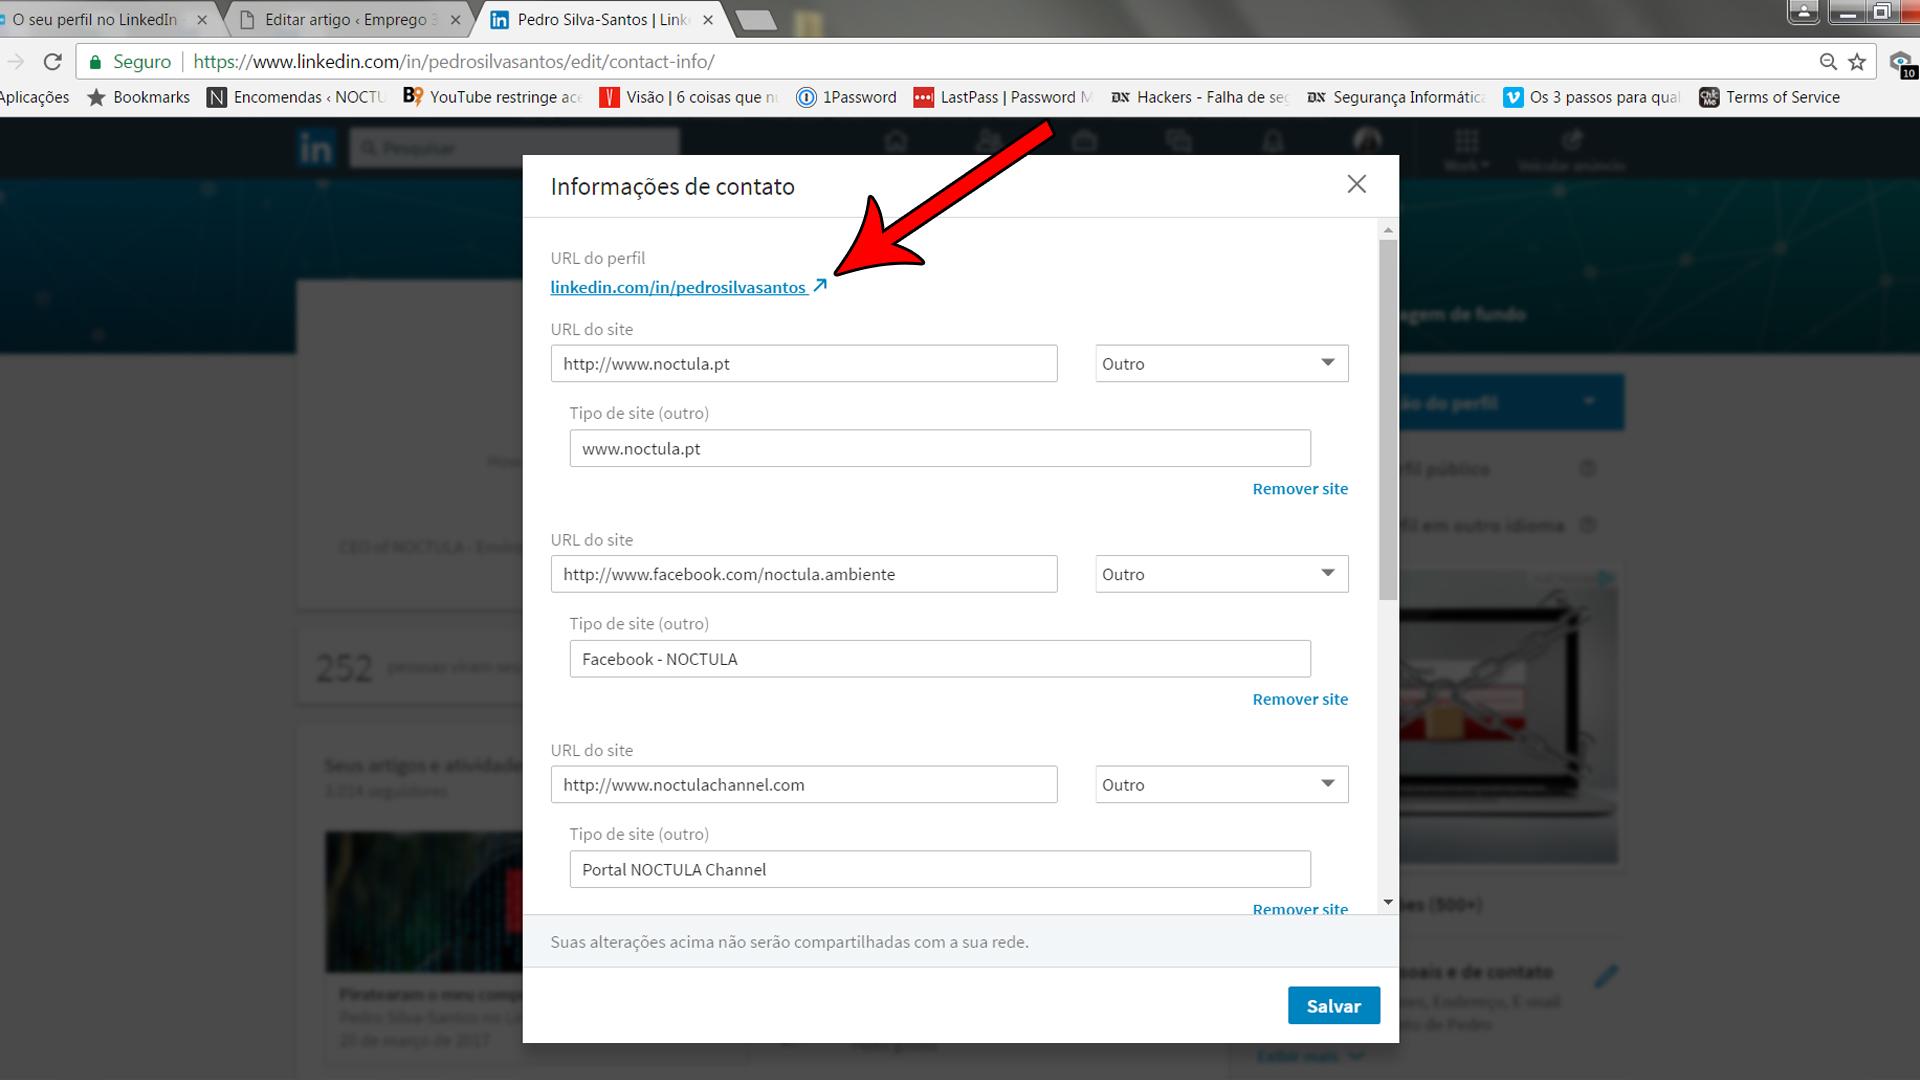 Setting up a profile on LinkedIn_02b